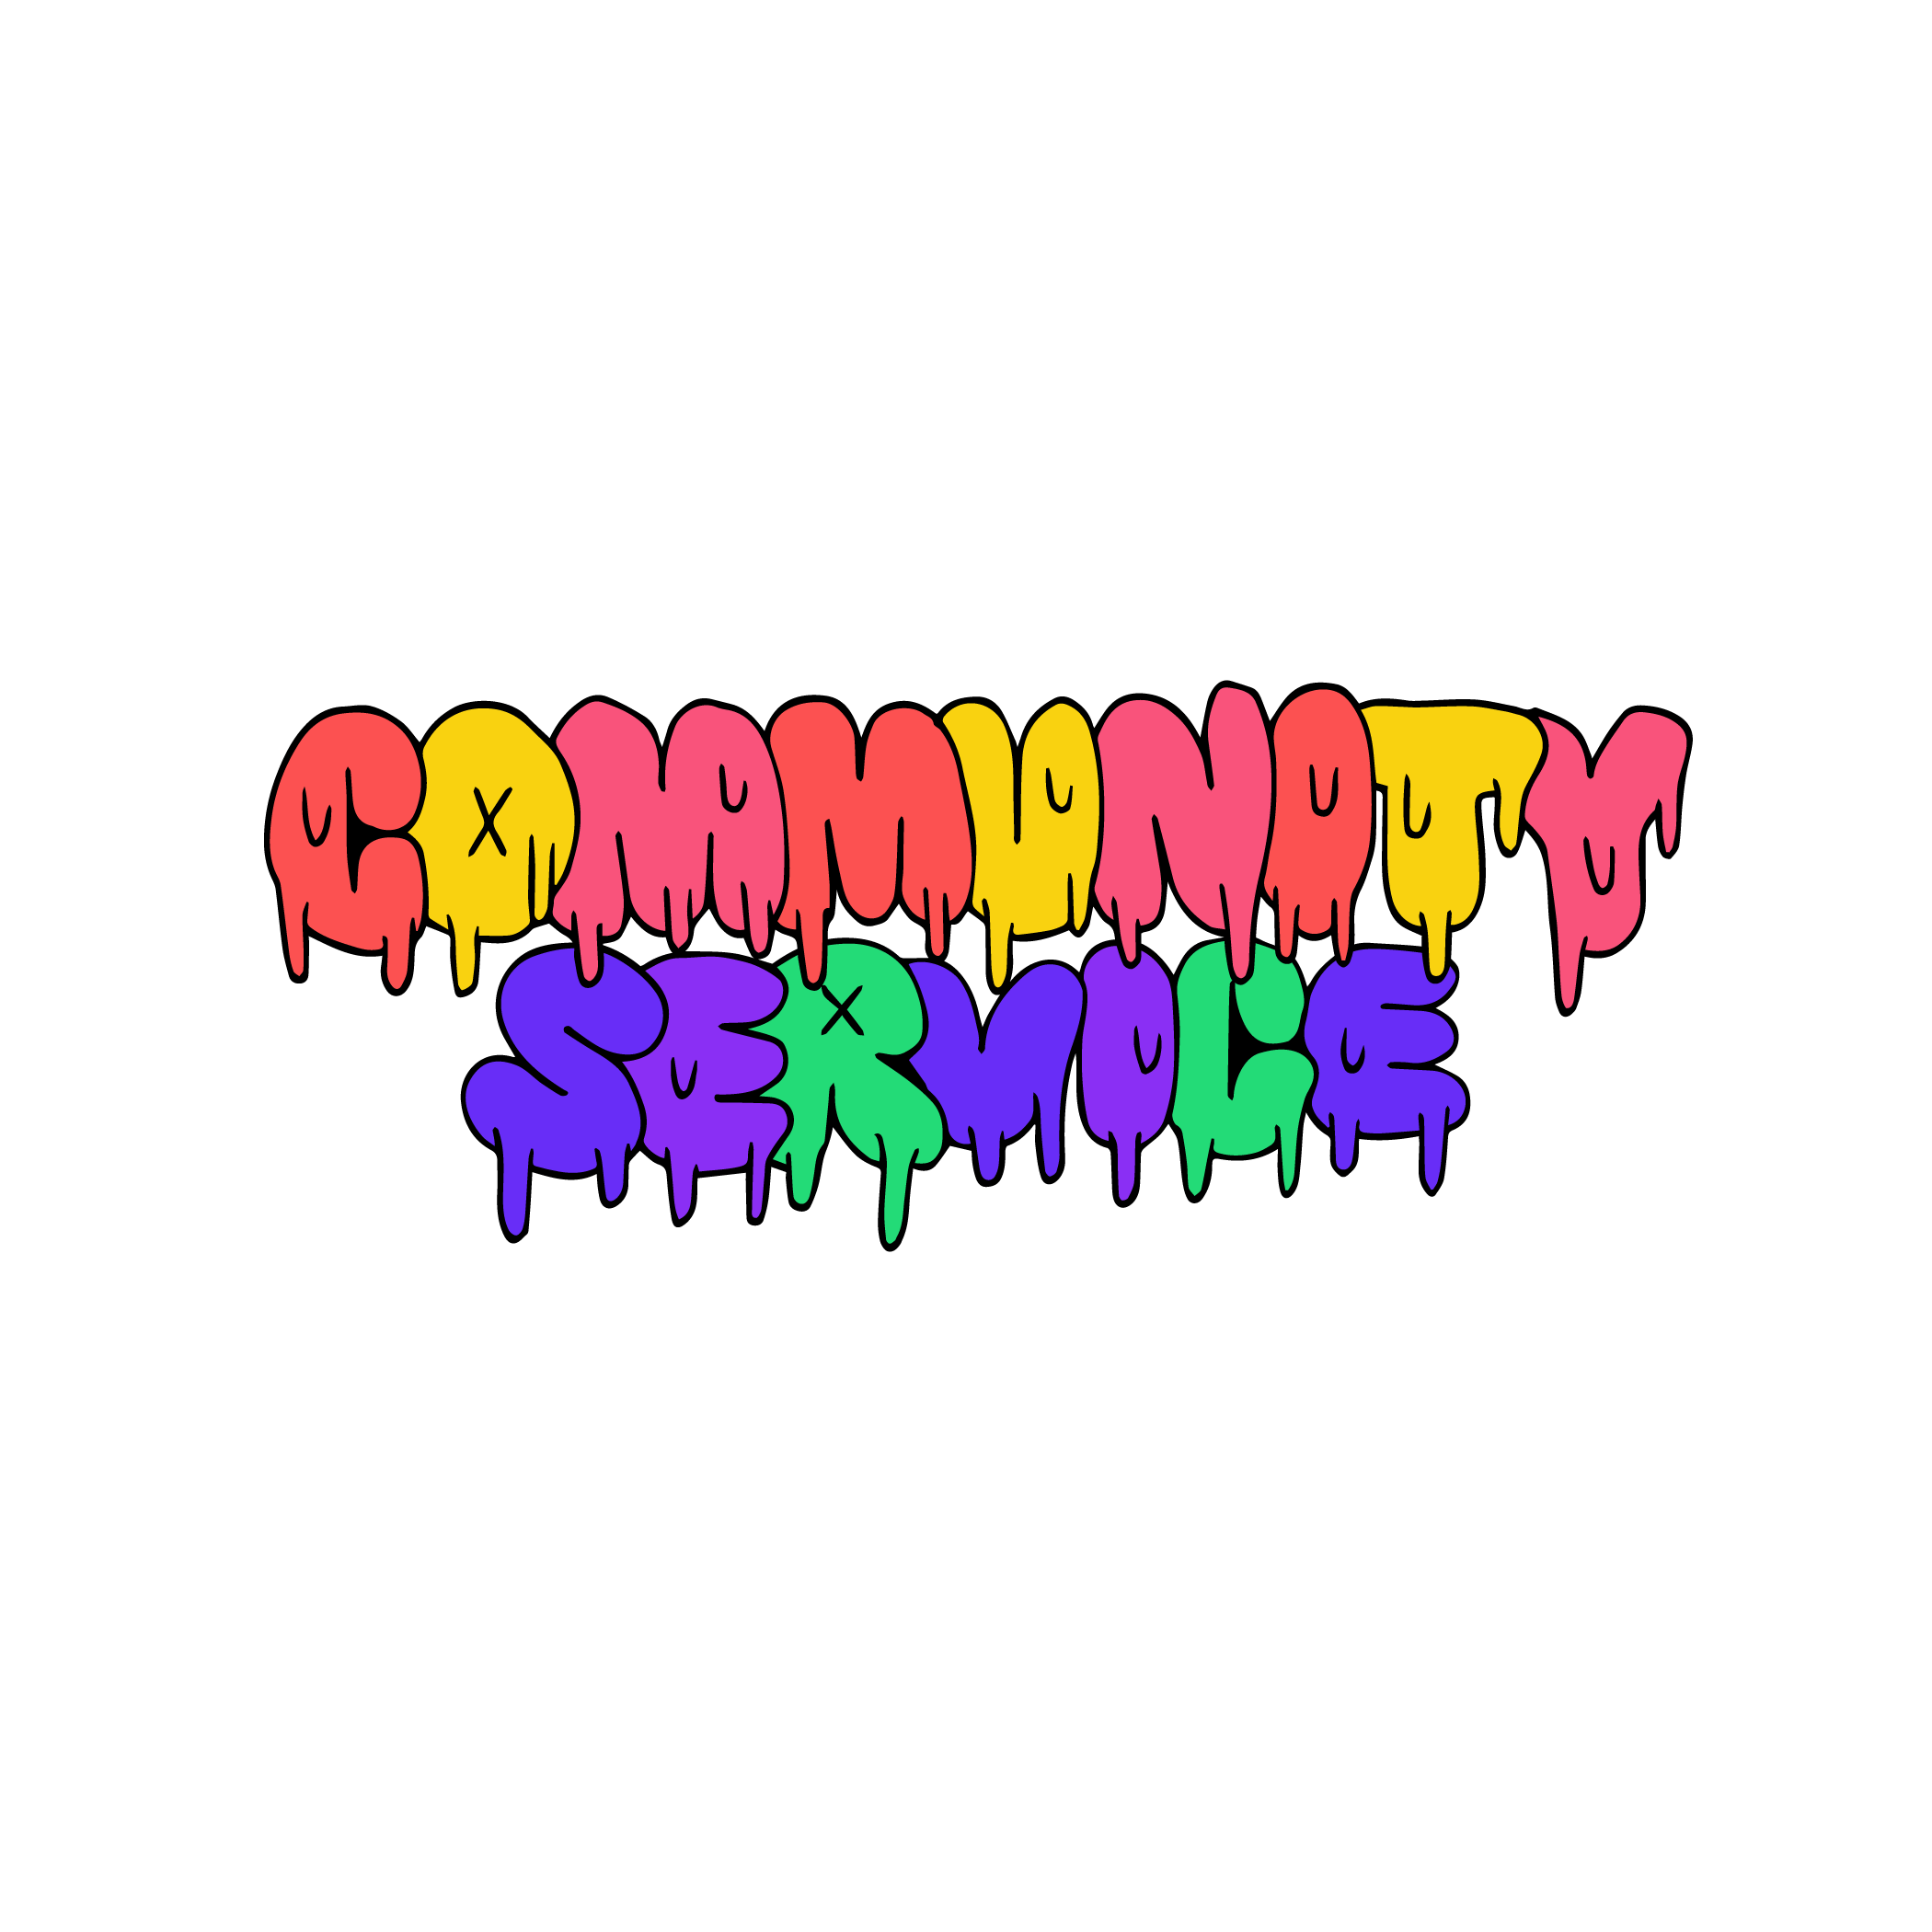 community service logo tspt-02.png